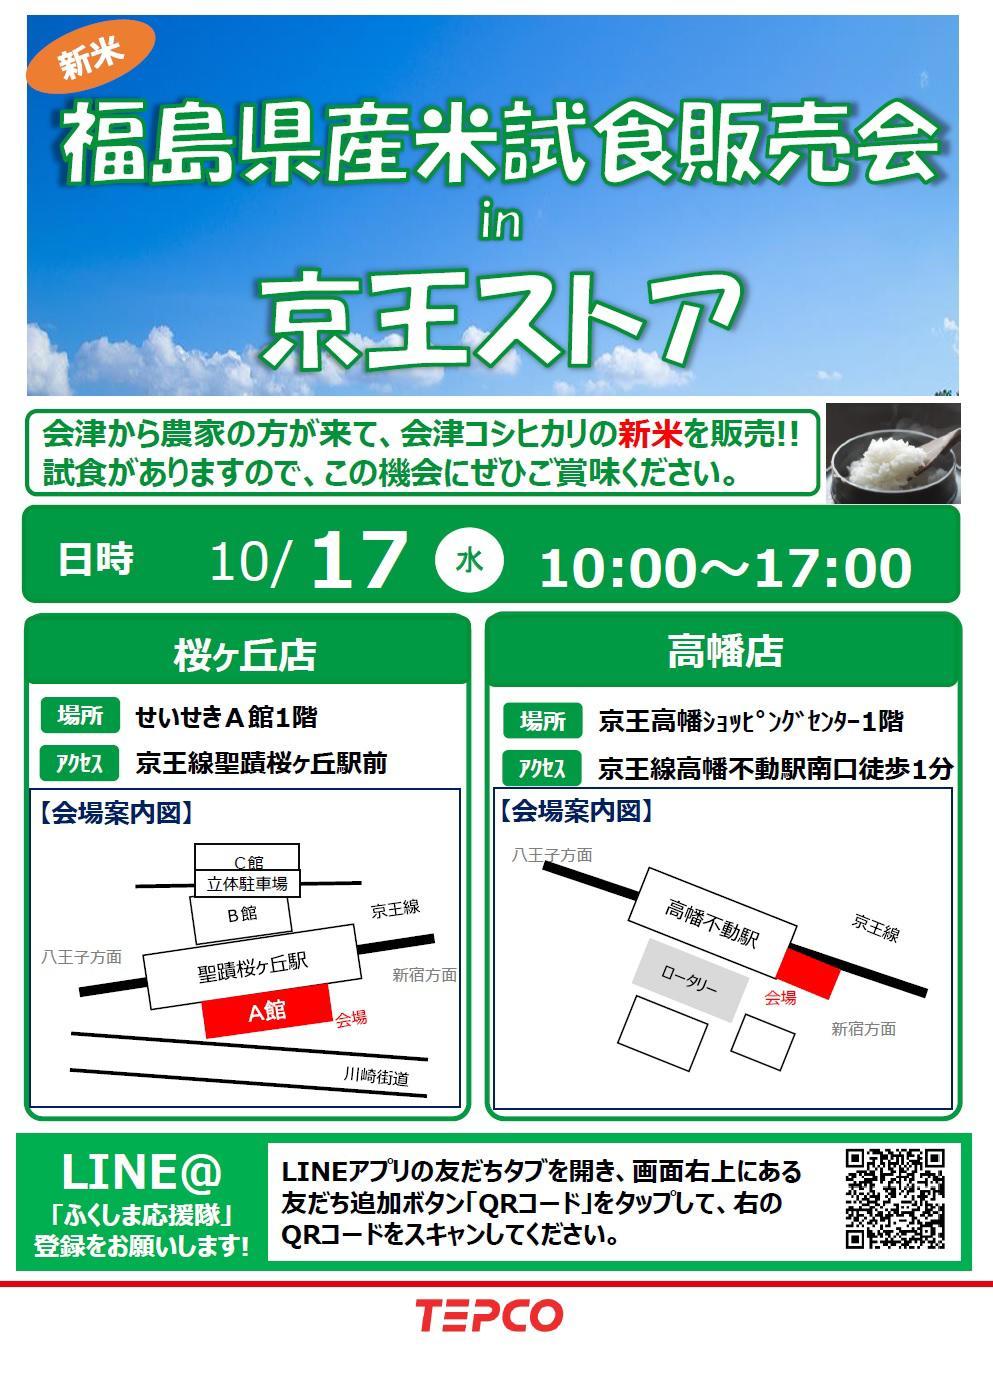 京王ストア新米試食販売会.jpg